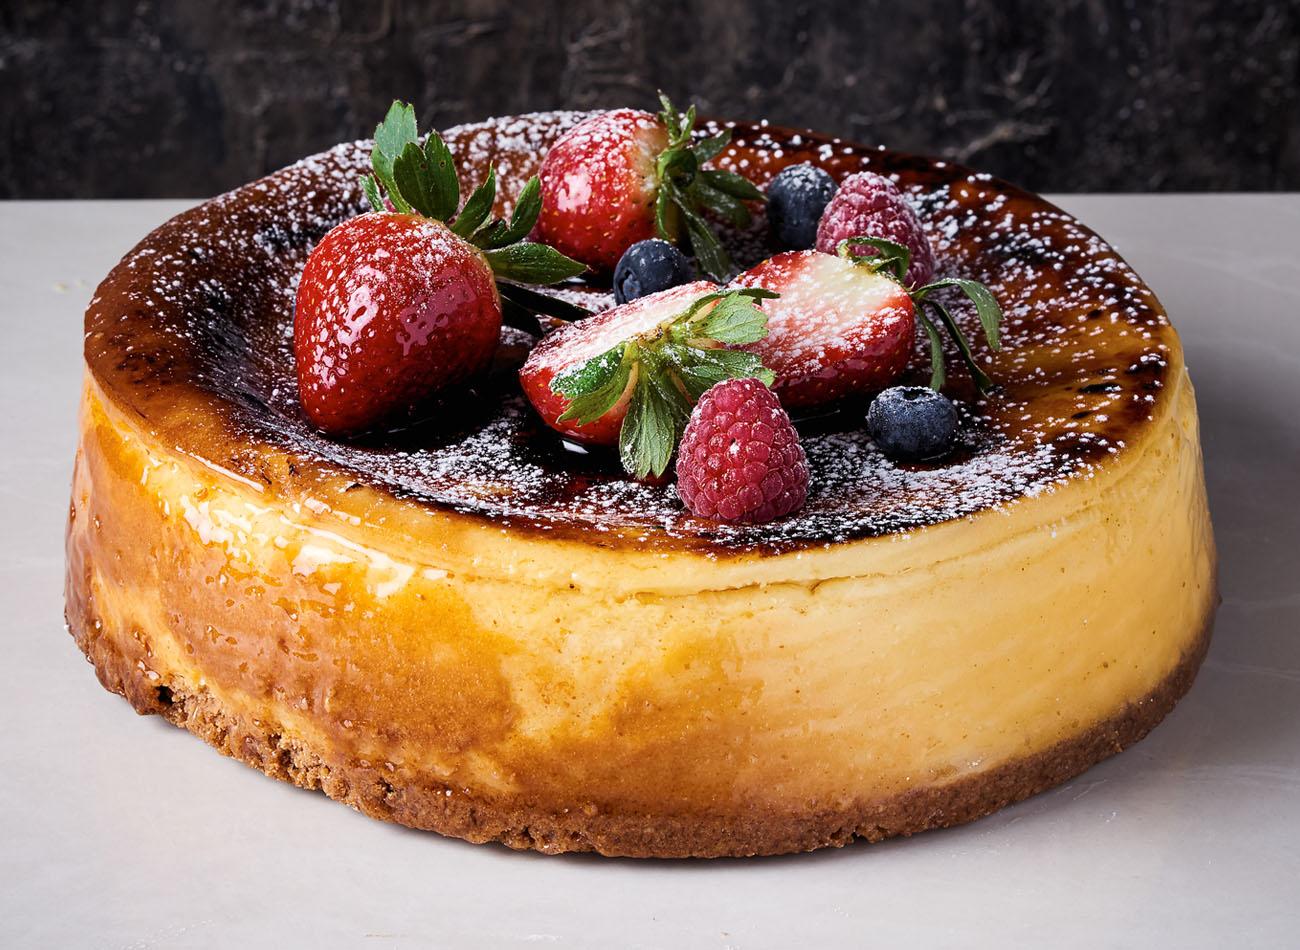 Best Cheesecake Recipe With Philadelphia Cream Cheese